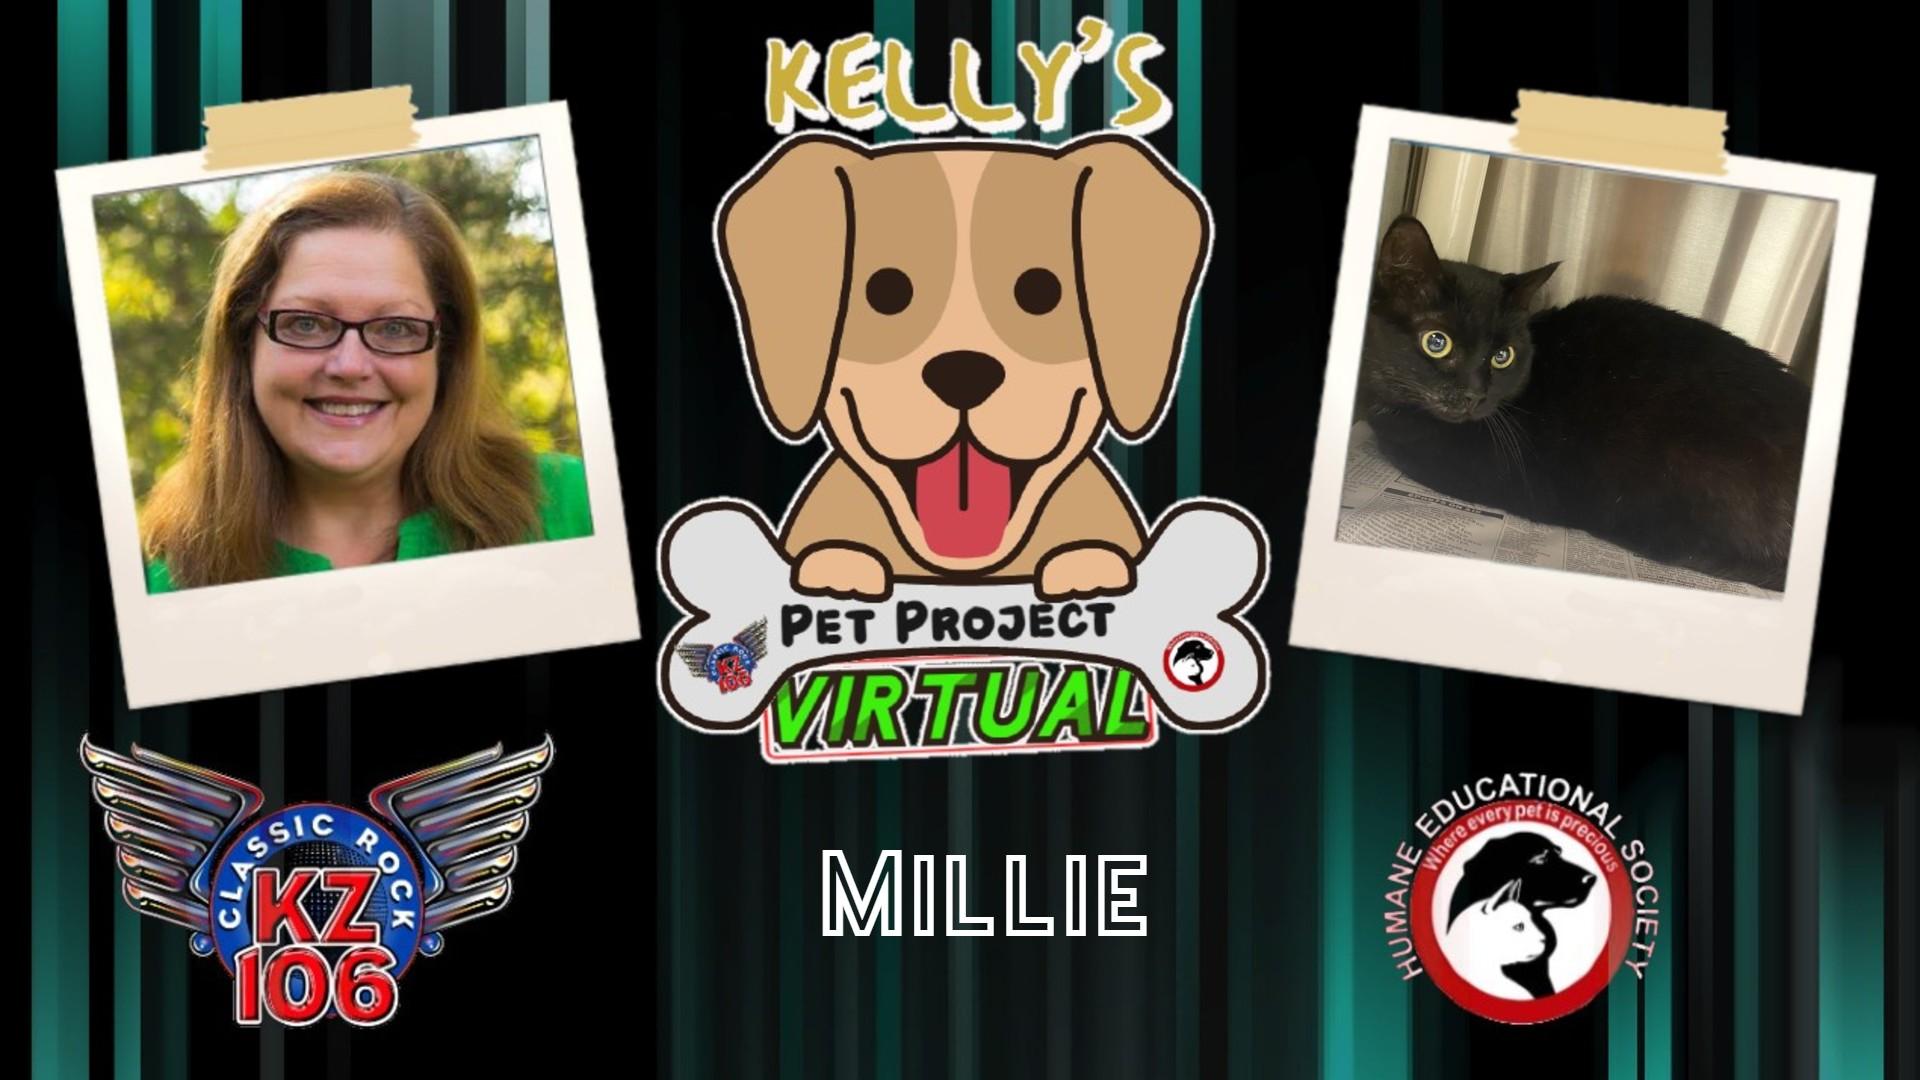 Kelly's Pet Project: Millie